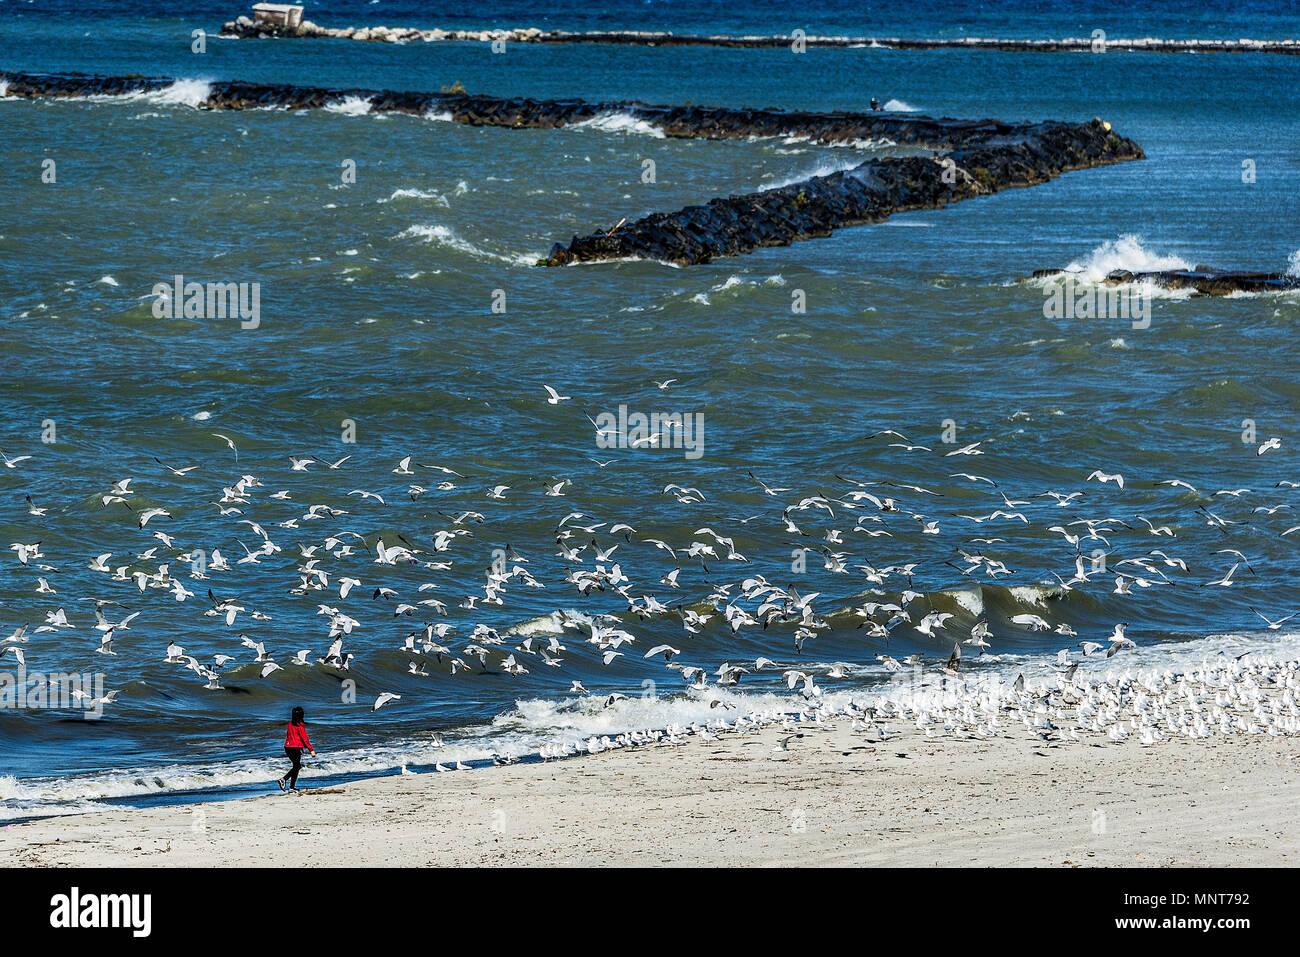 Girl scares seagulls to flight, Lake Erie, Conneaut, Ohio, USA. - Stock Image